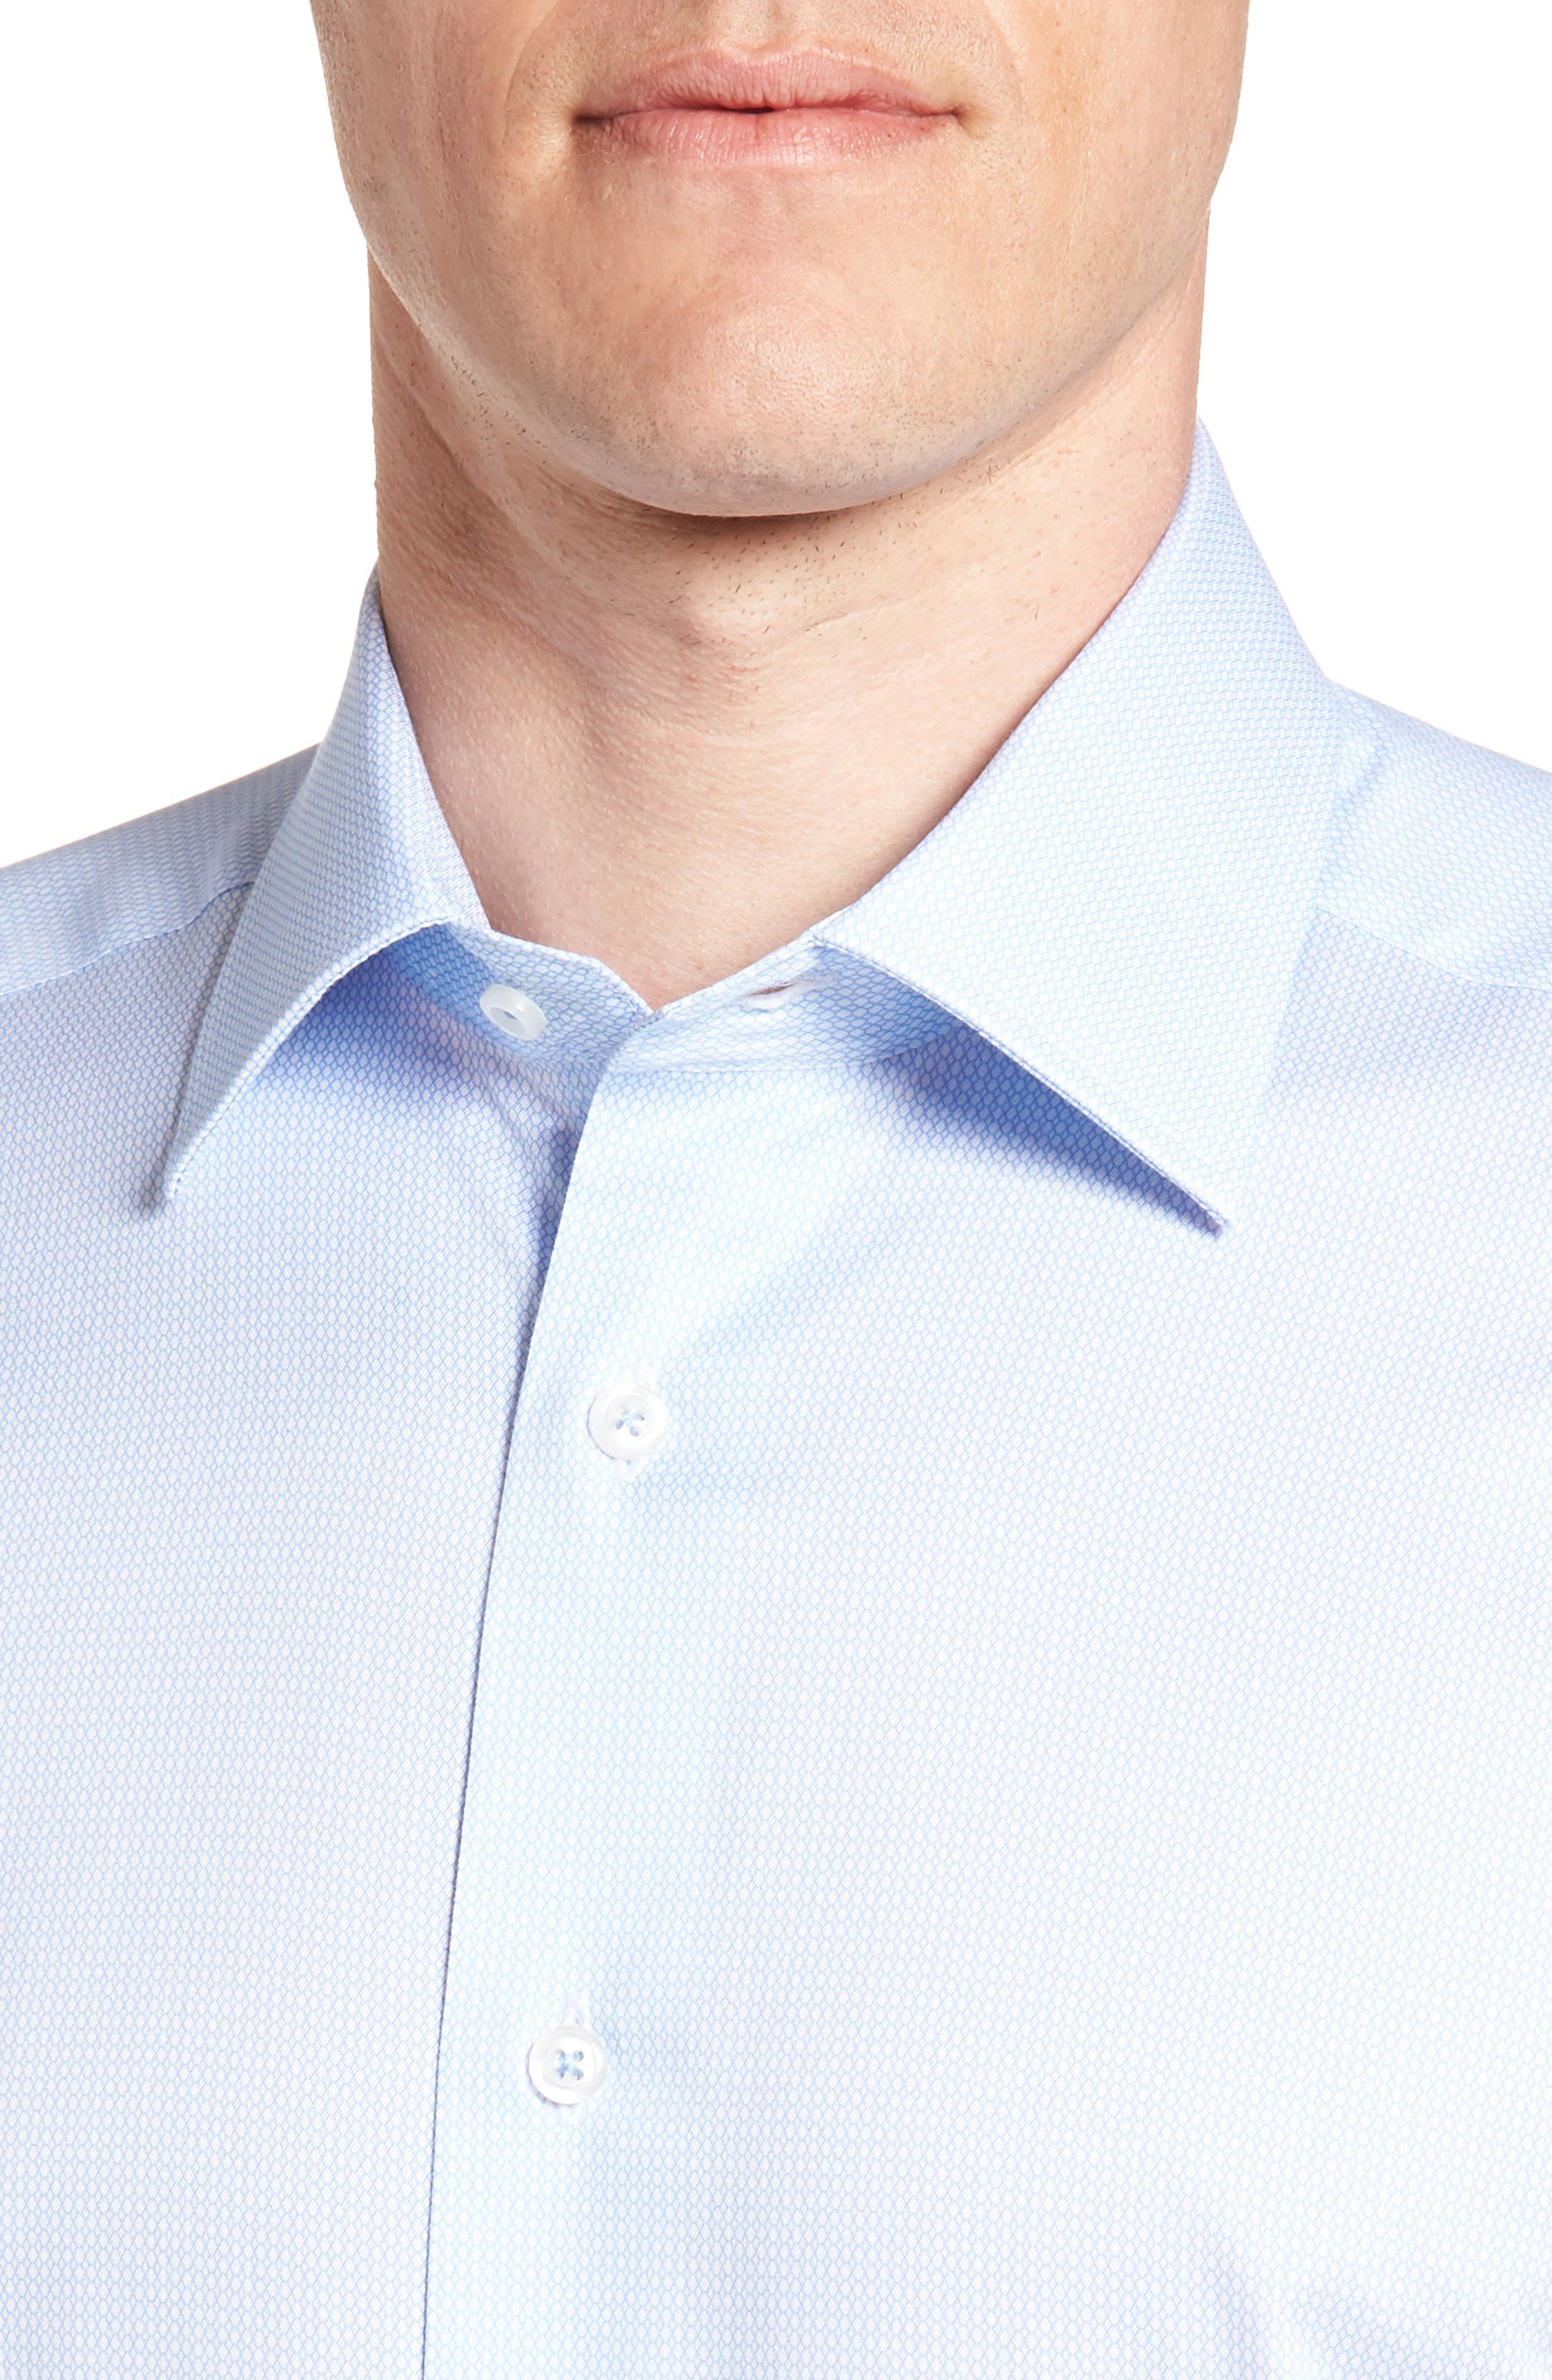 Nickoe Trim Fit Dress Shirt,                             Alternate thumbnail 2, color,                             BLUE